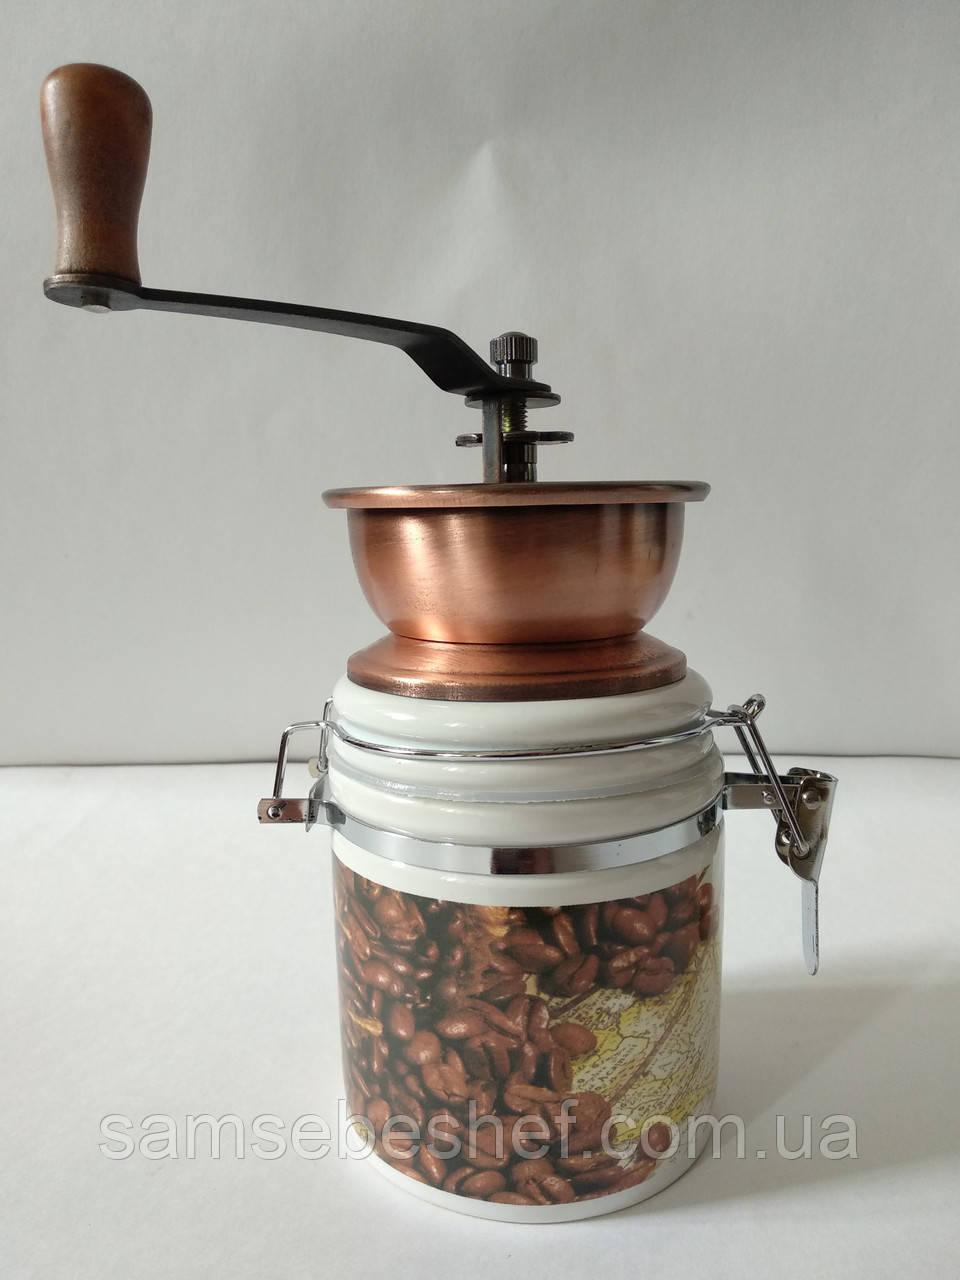 Кофемолка ручная GA Dynasty 250 мл, 23025